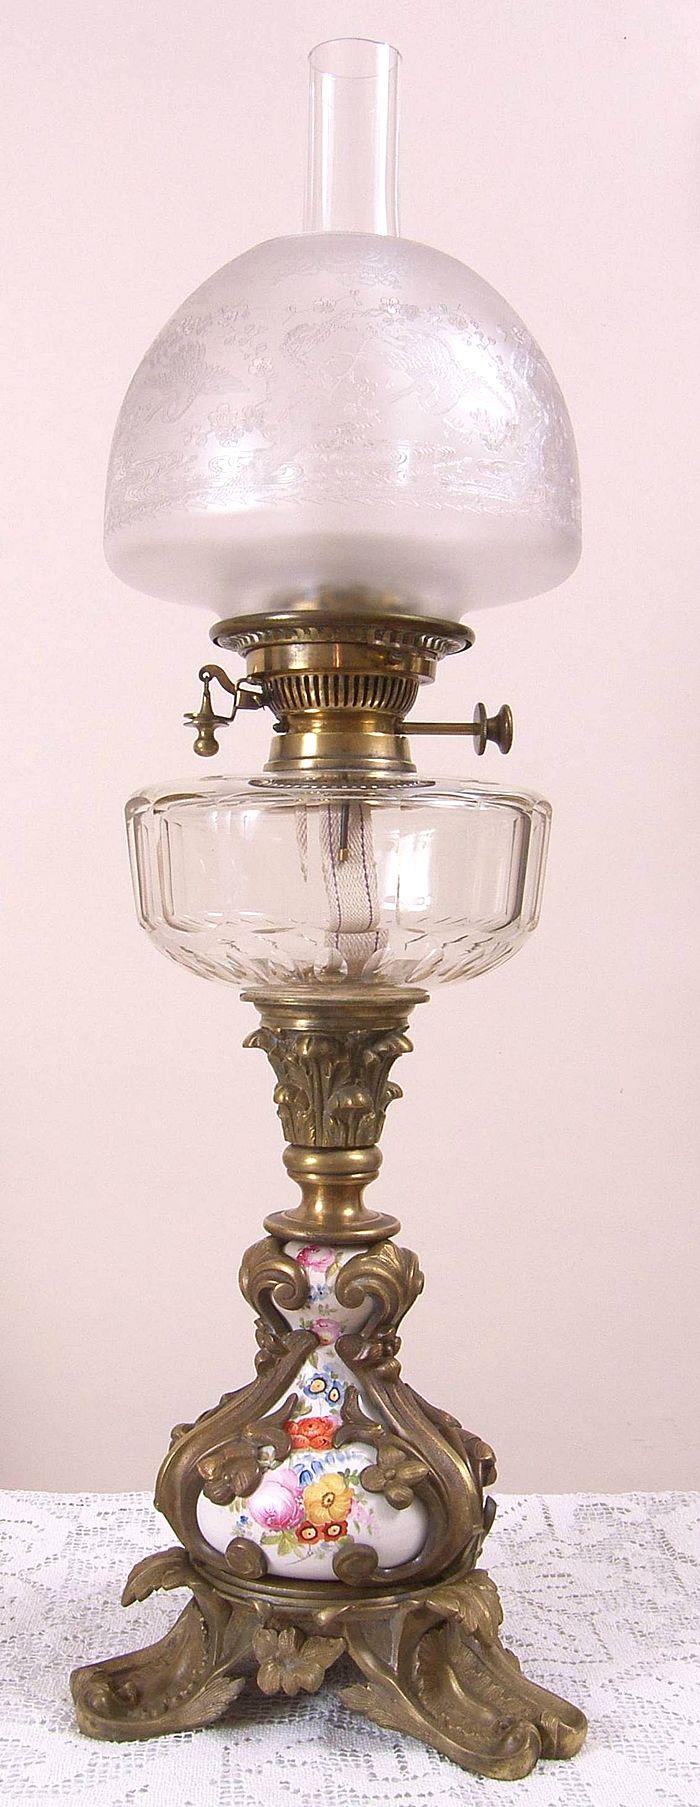 58 best Kerosene-Candle-Gas iii images on Pinterest ...